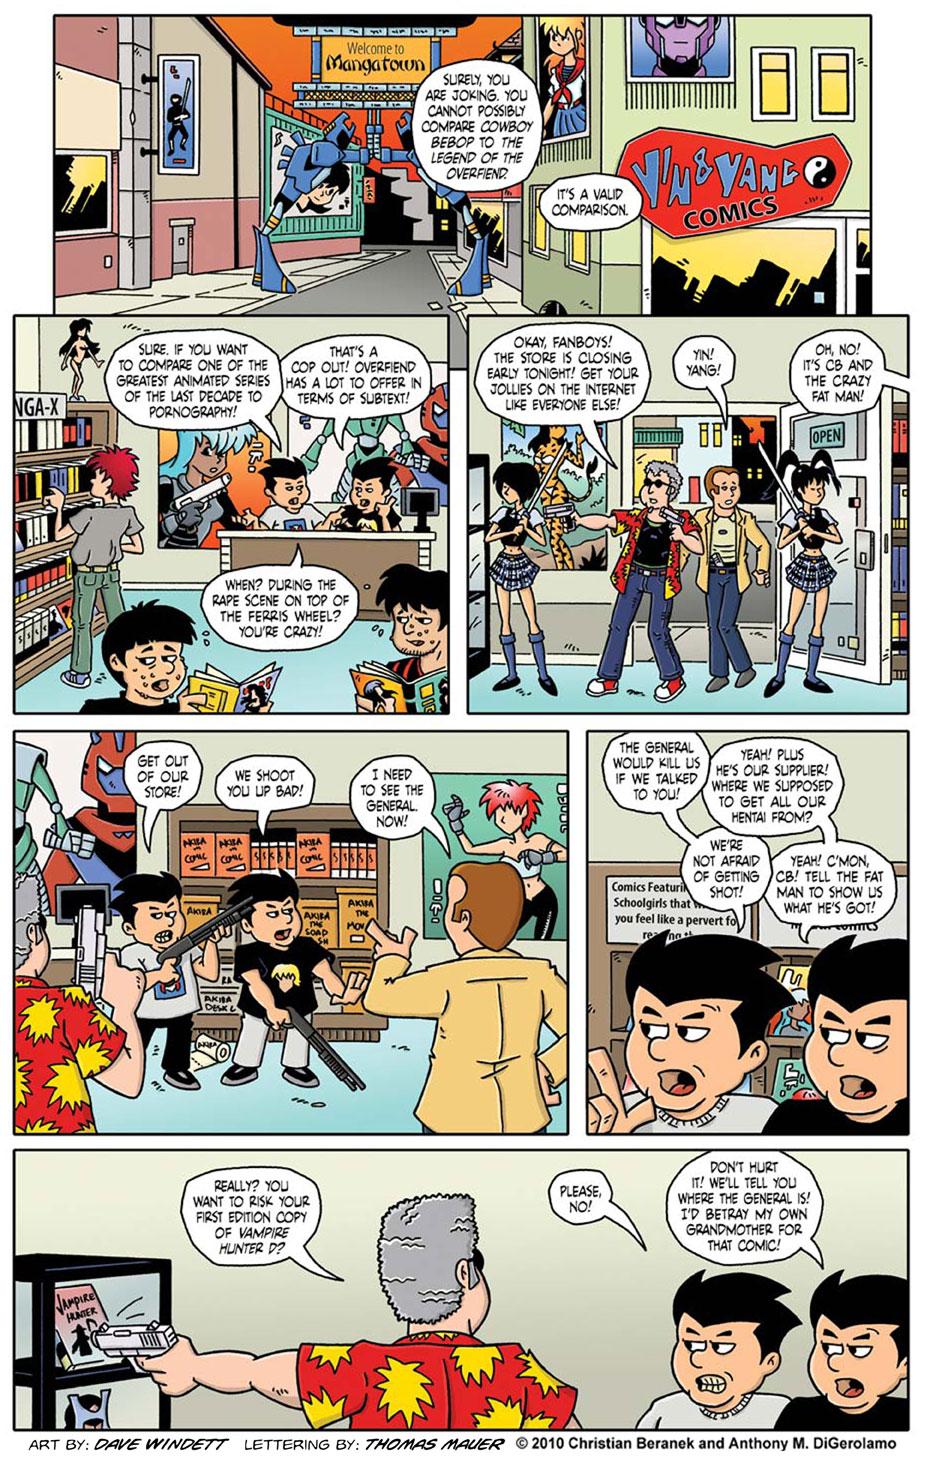 Comic Book Mafia #19: Every Collectible Has a Price